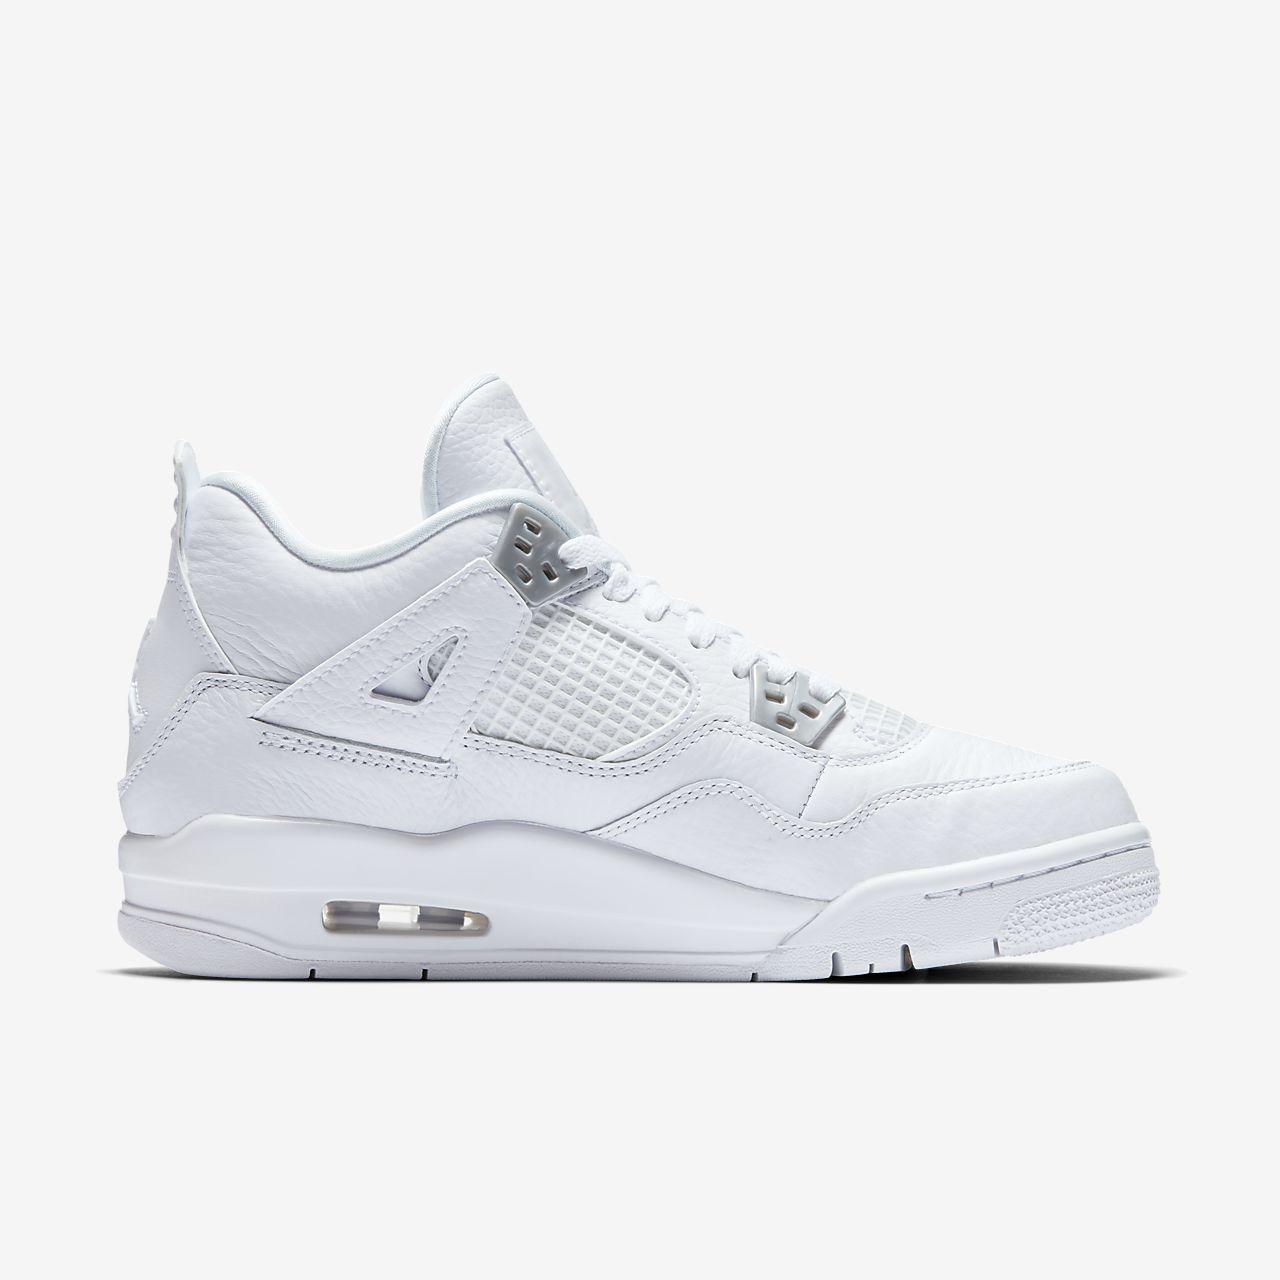 outlet store 8f31c a689b Air Jordan 4 Retro Older Kids (Boys) Shoe . ...